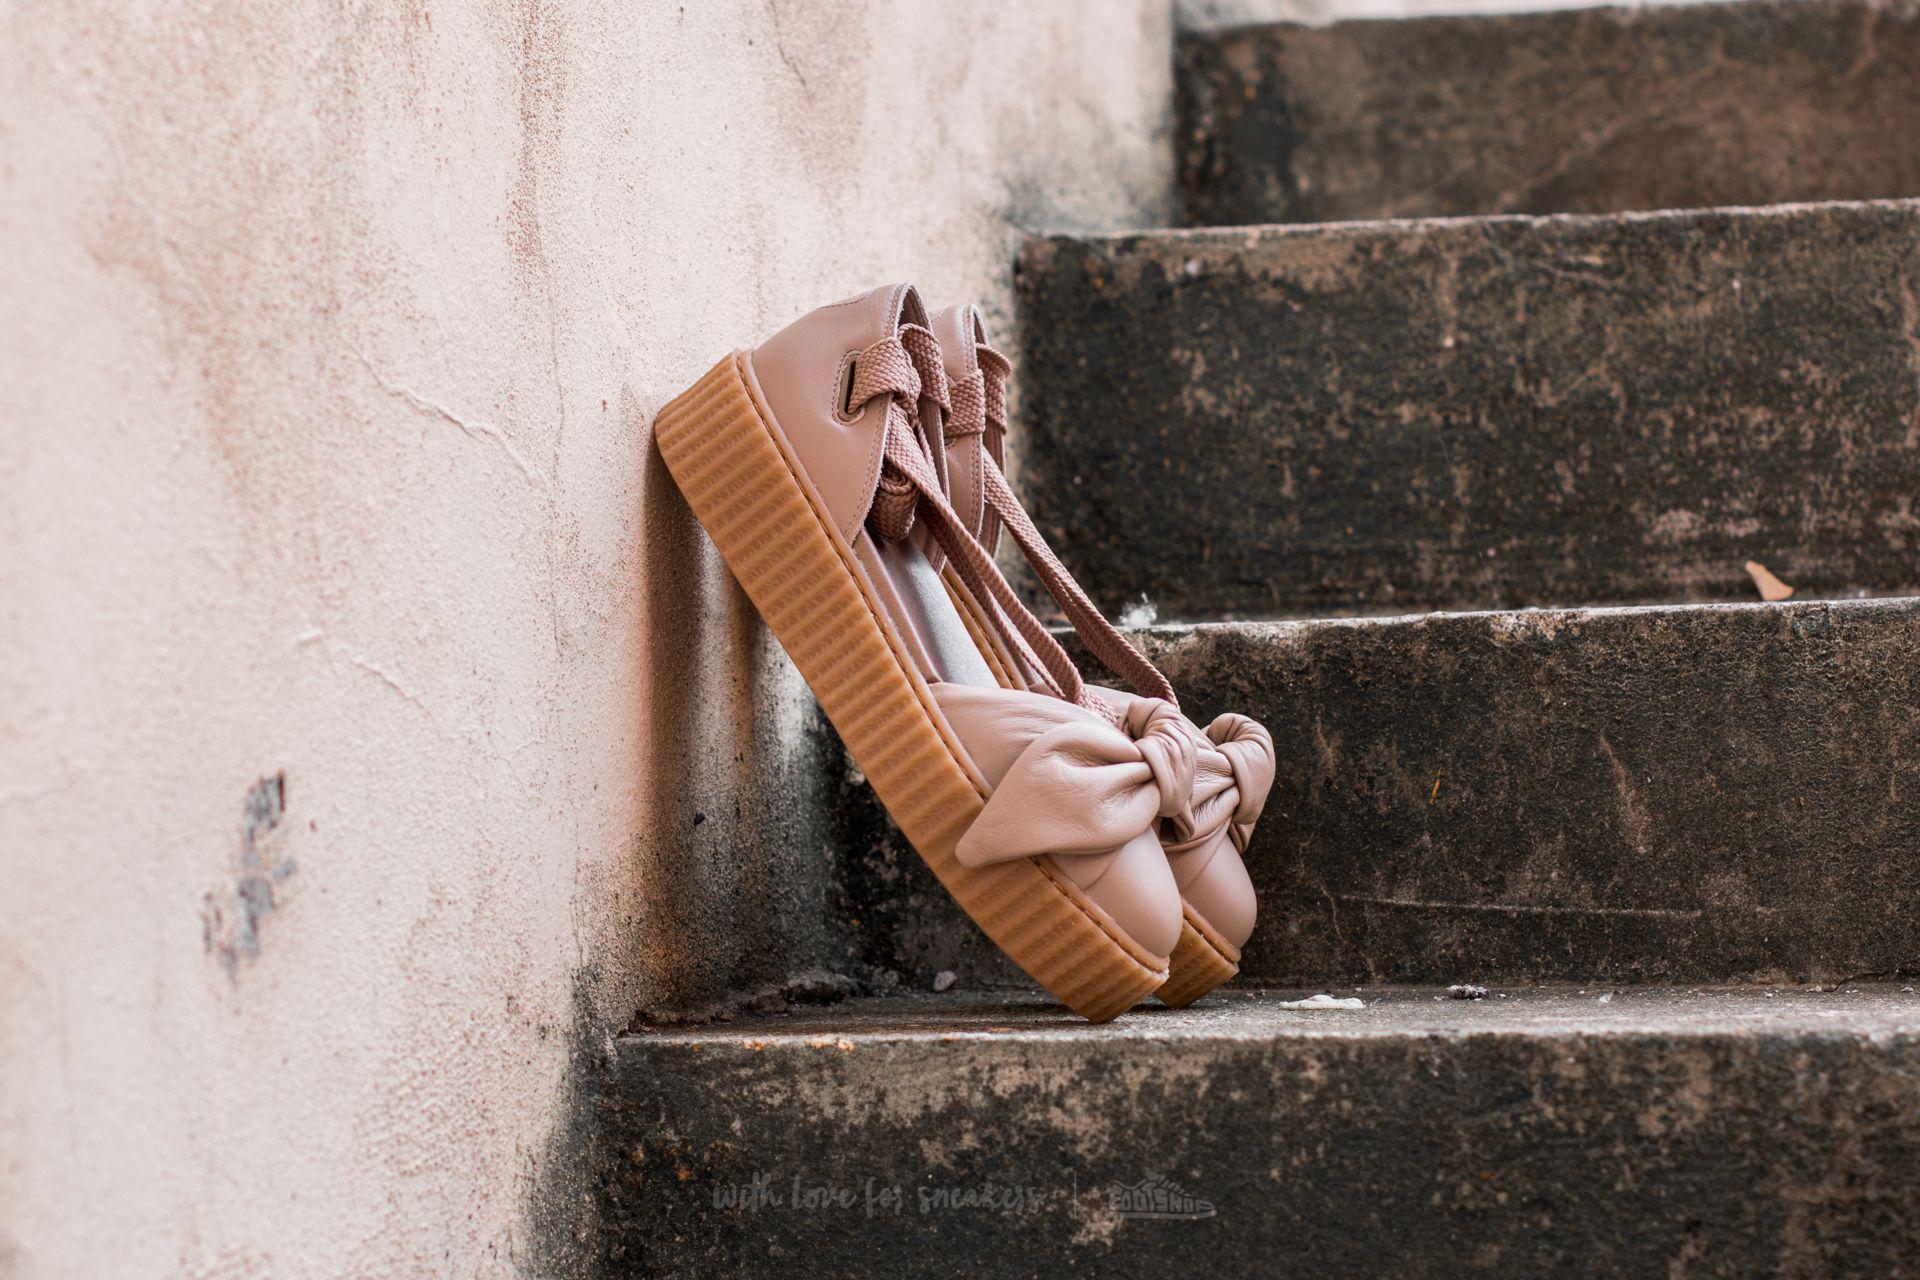 Lyst - PUMA X Rihanna Bow Creeper Sandal Natural-natural-oatmeal 85bcc9dab